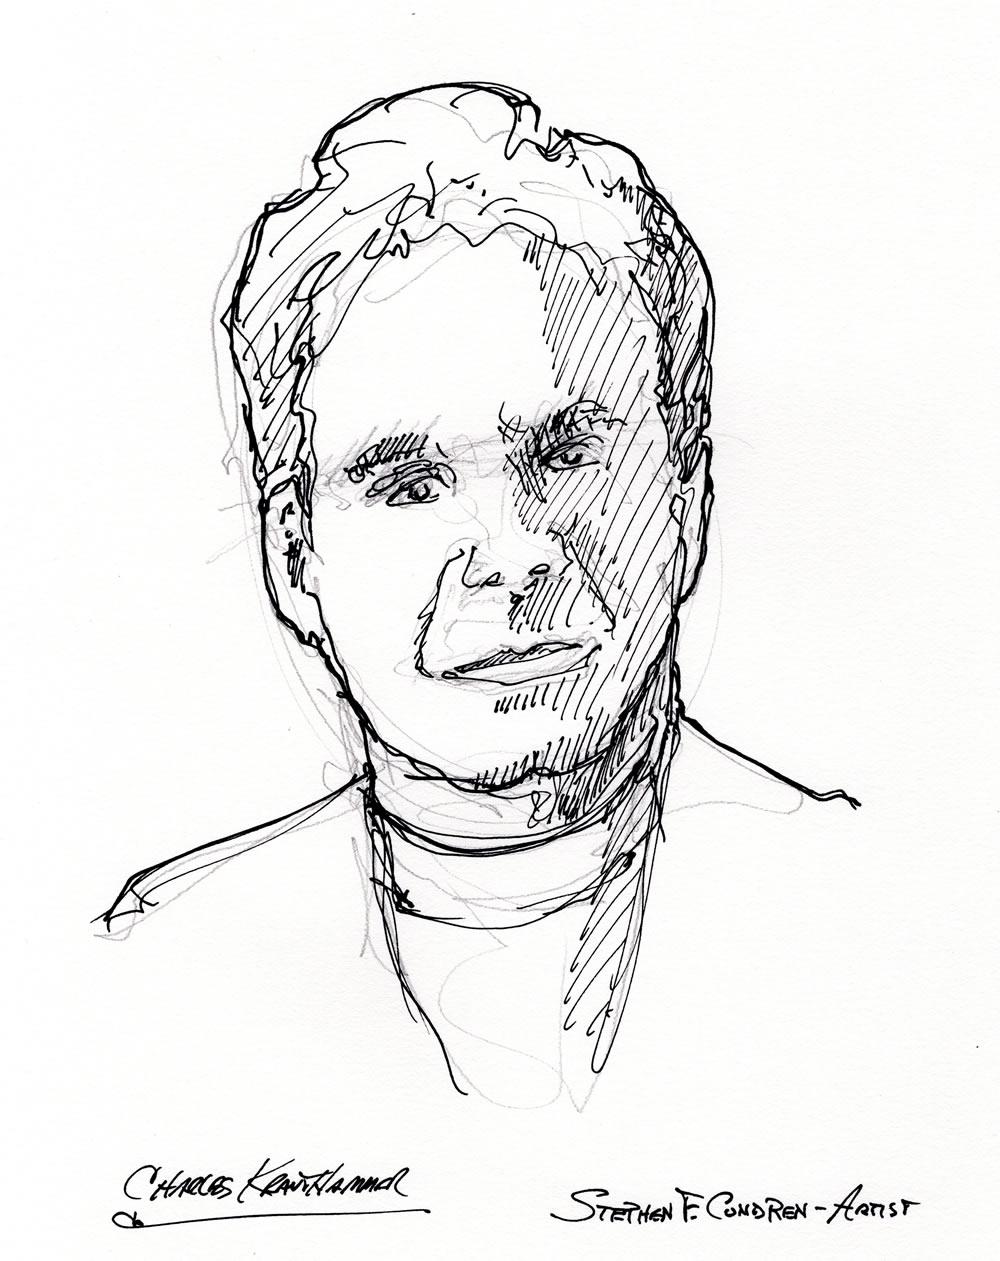 Charles Krauthammer celebrity art pen & ink drawing